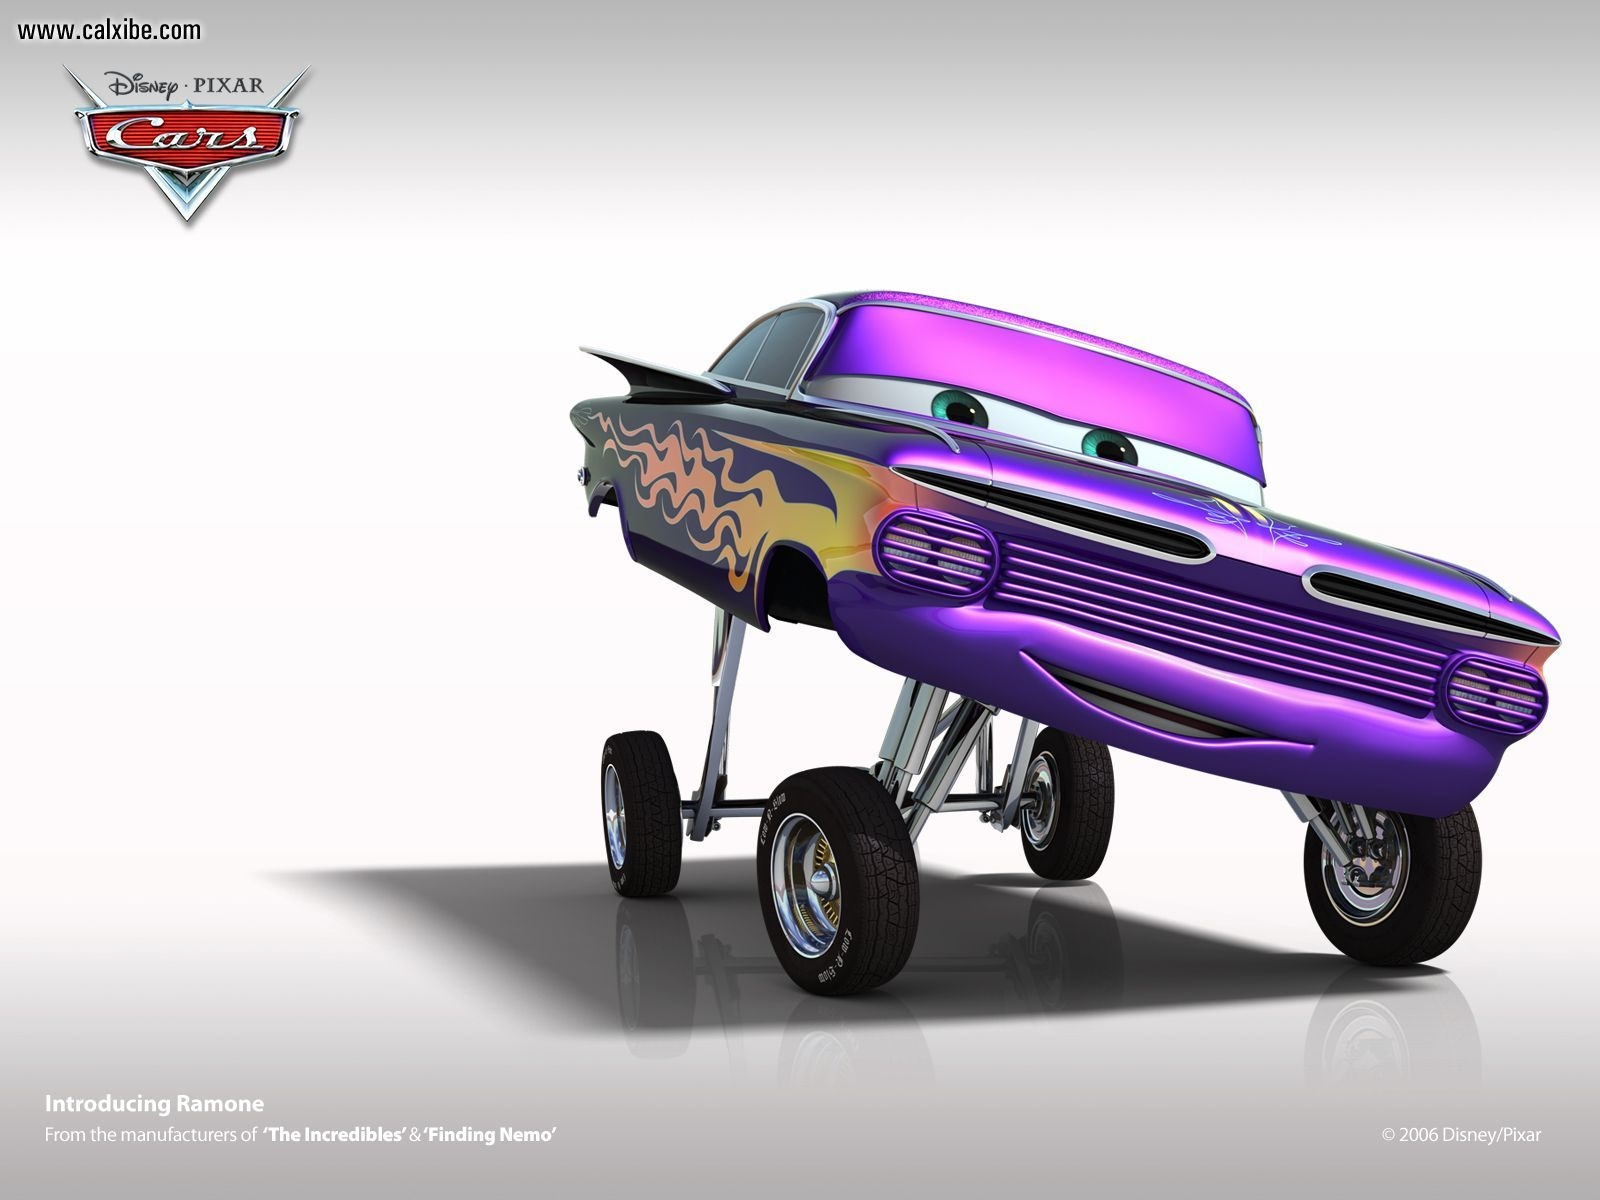 ramone disney pixar cars 2 free hd wallpaper 1600x1200